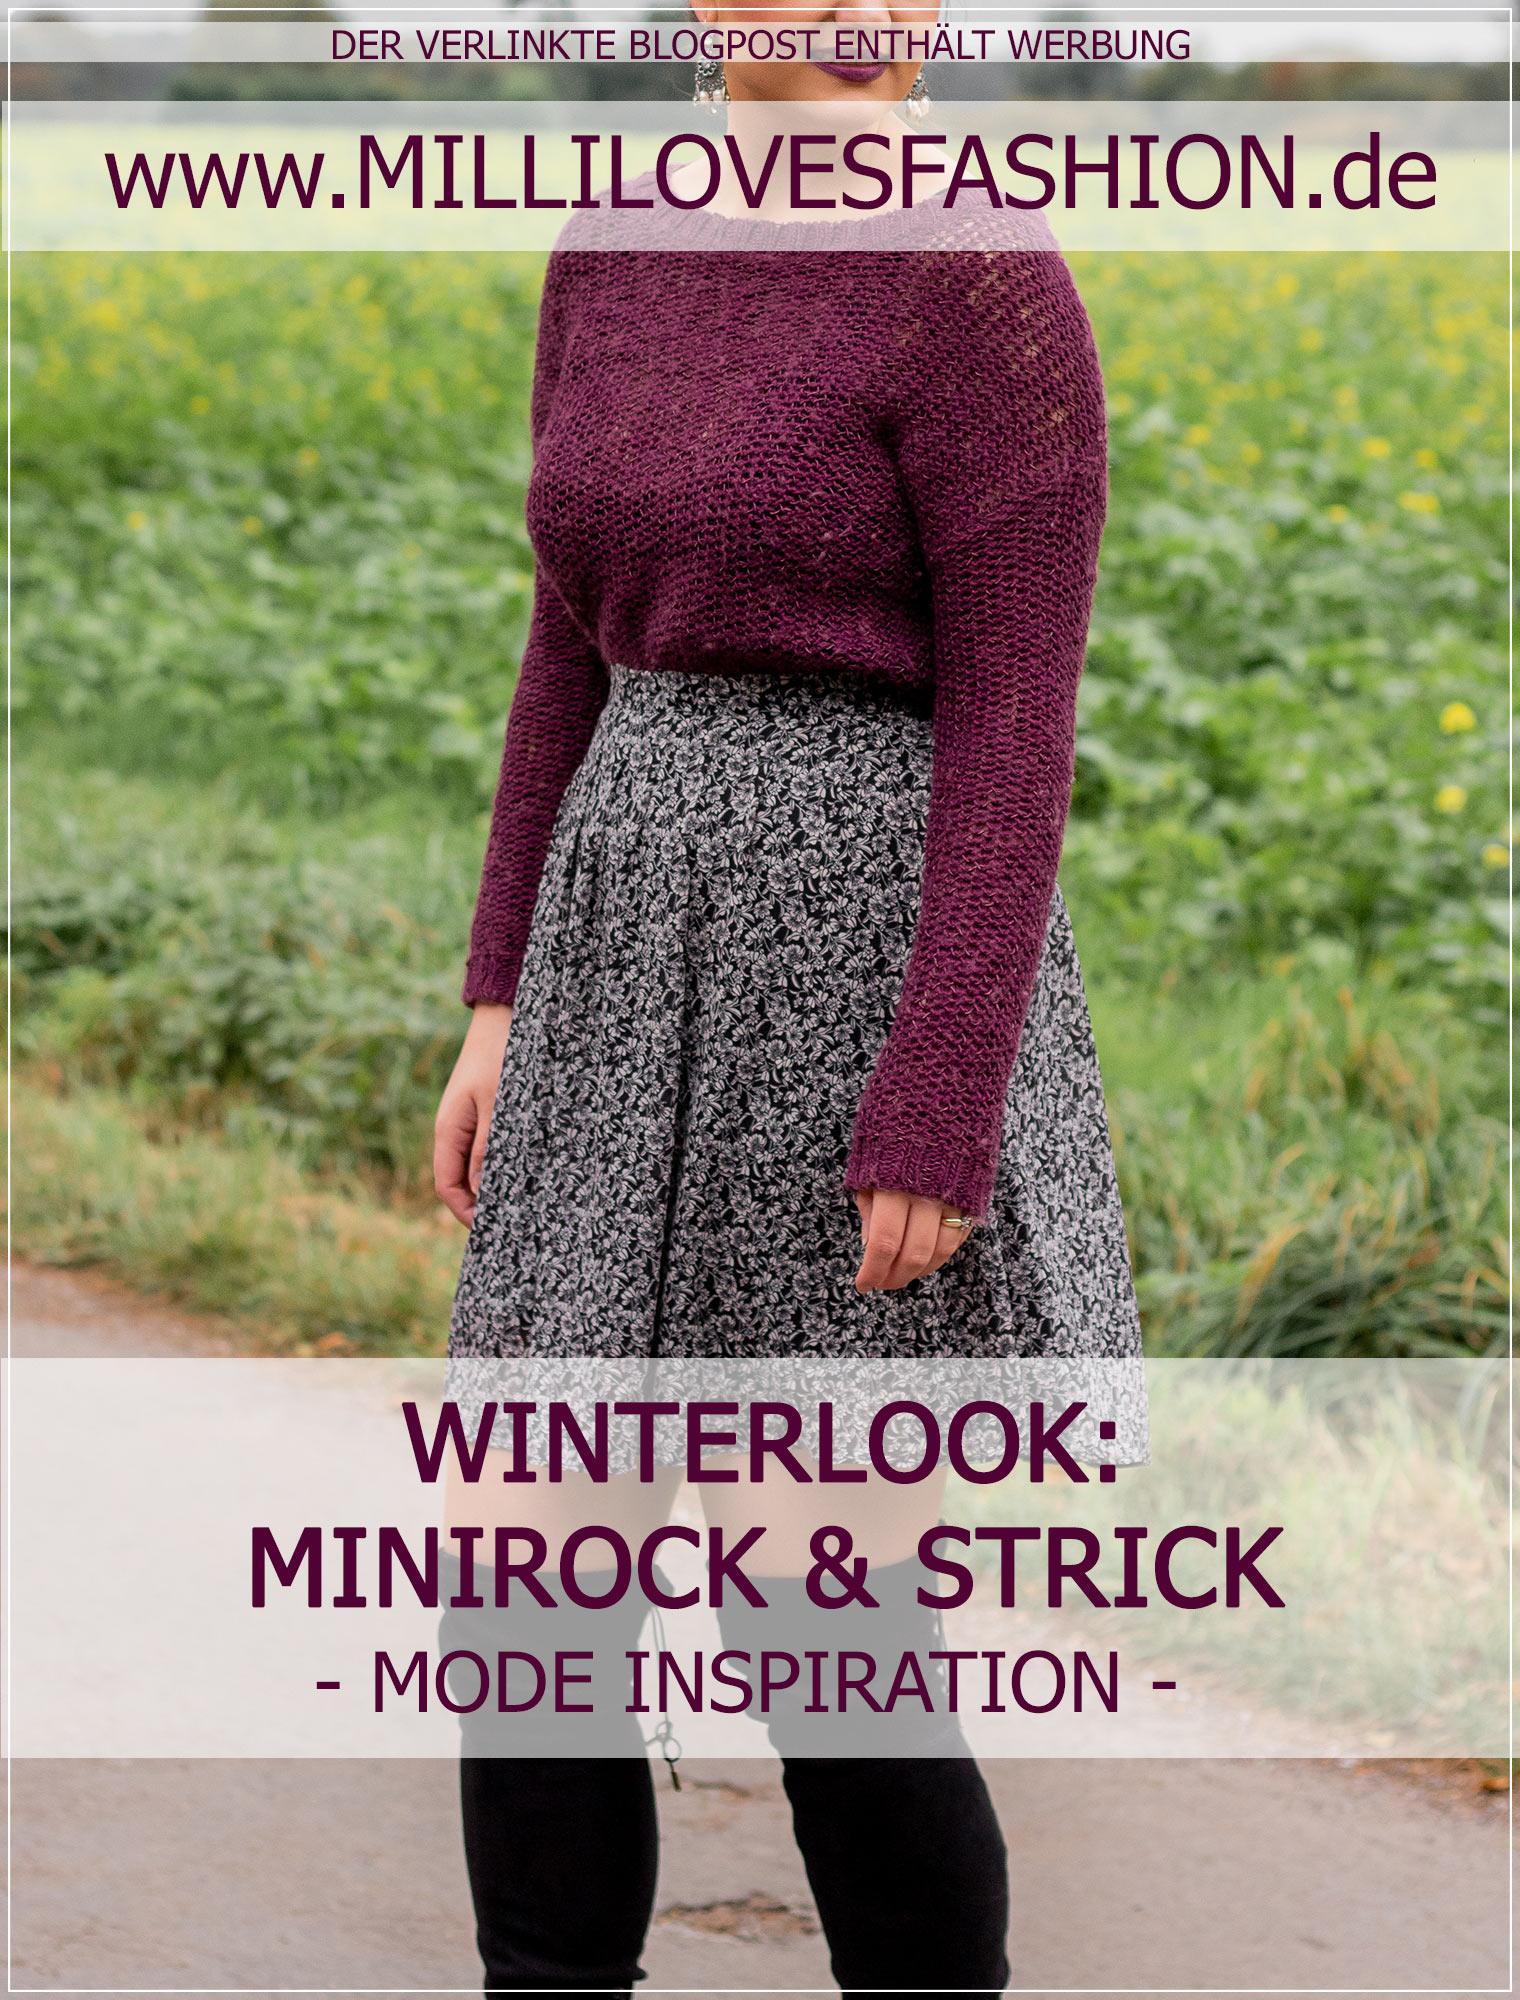 Strick, Minirock und Overknees im Winter kombinieren